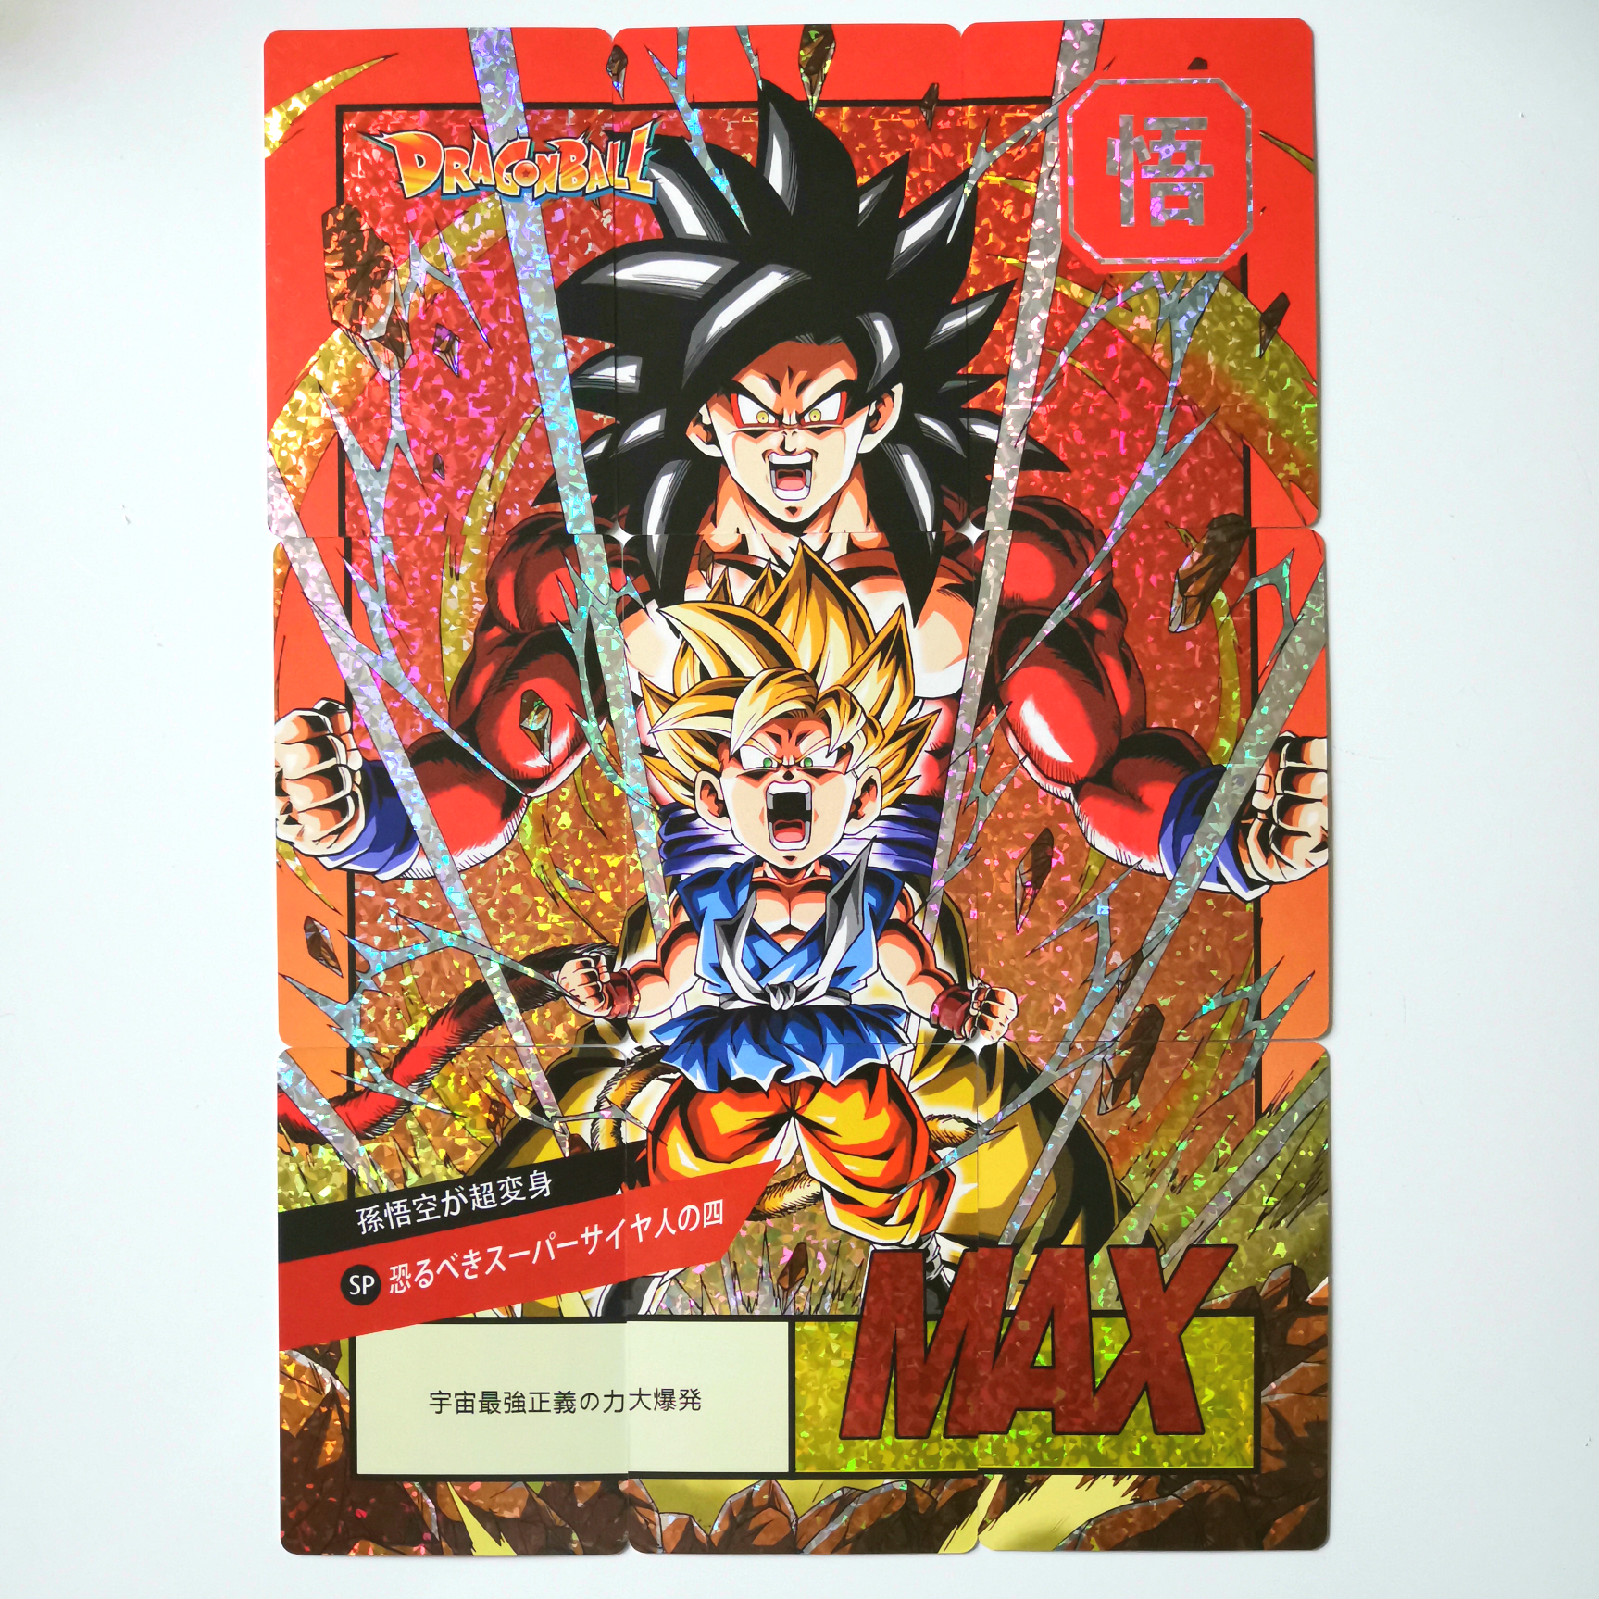 27pcs/set Super Dragon Ball Z Heroes Battle Card Ultra Instinct Goku Vegeta Game Collection Cards